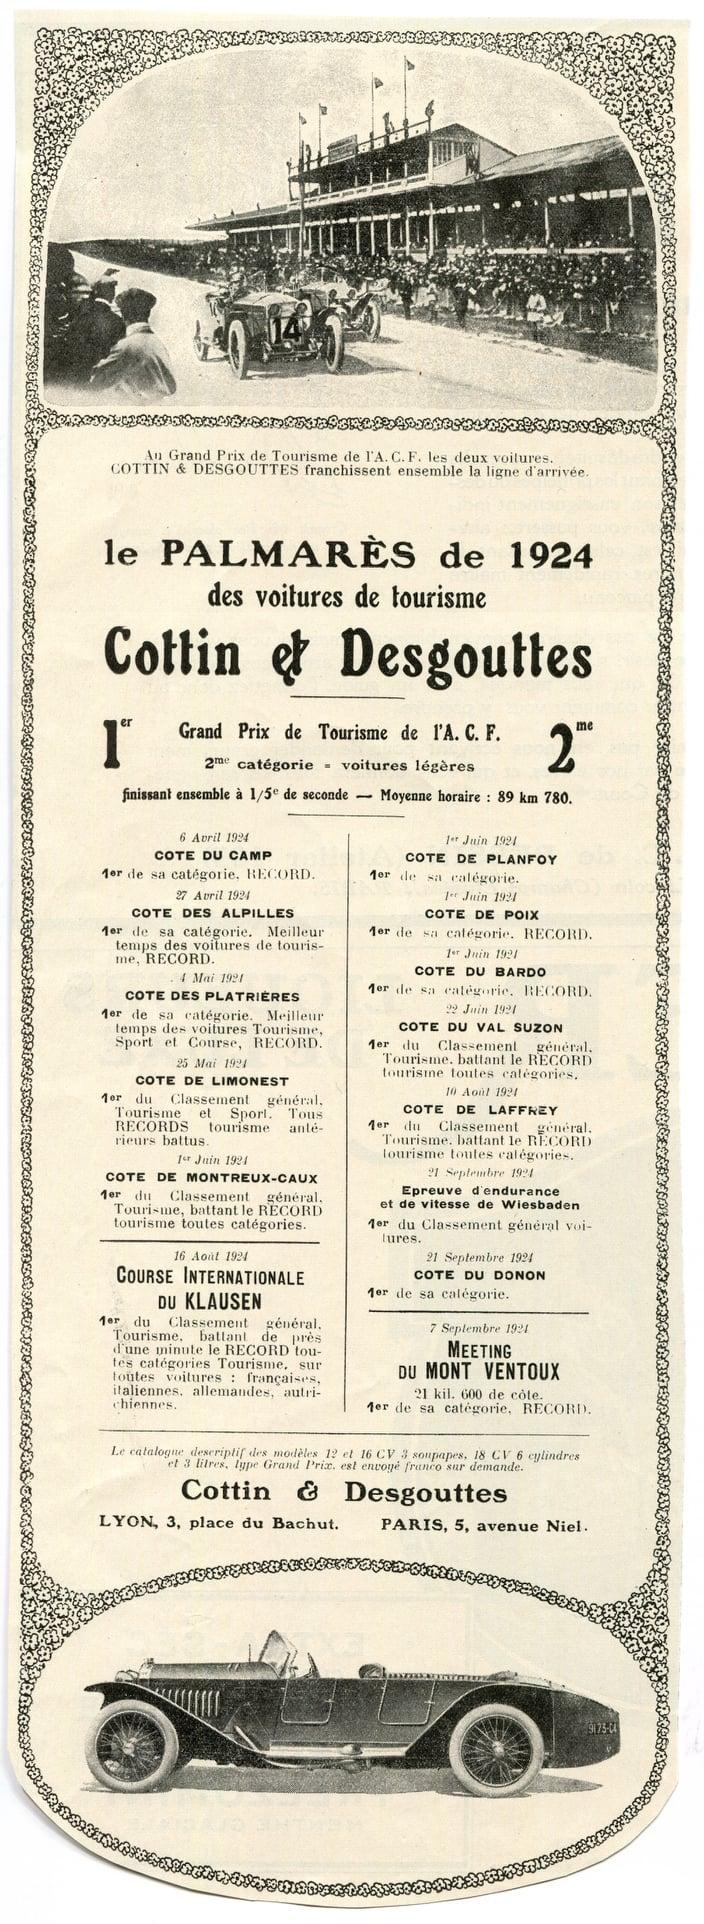 Kleinzoon-van-de-oprichter-Pierre-Desgoutte-archief-(16)